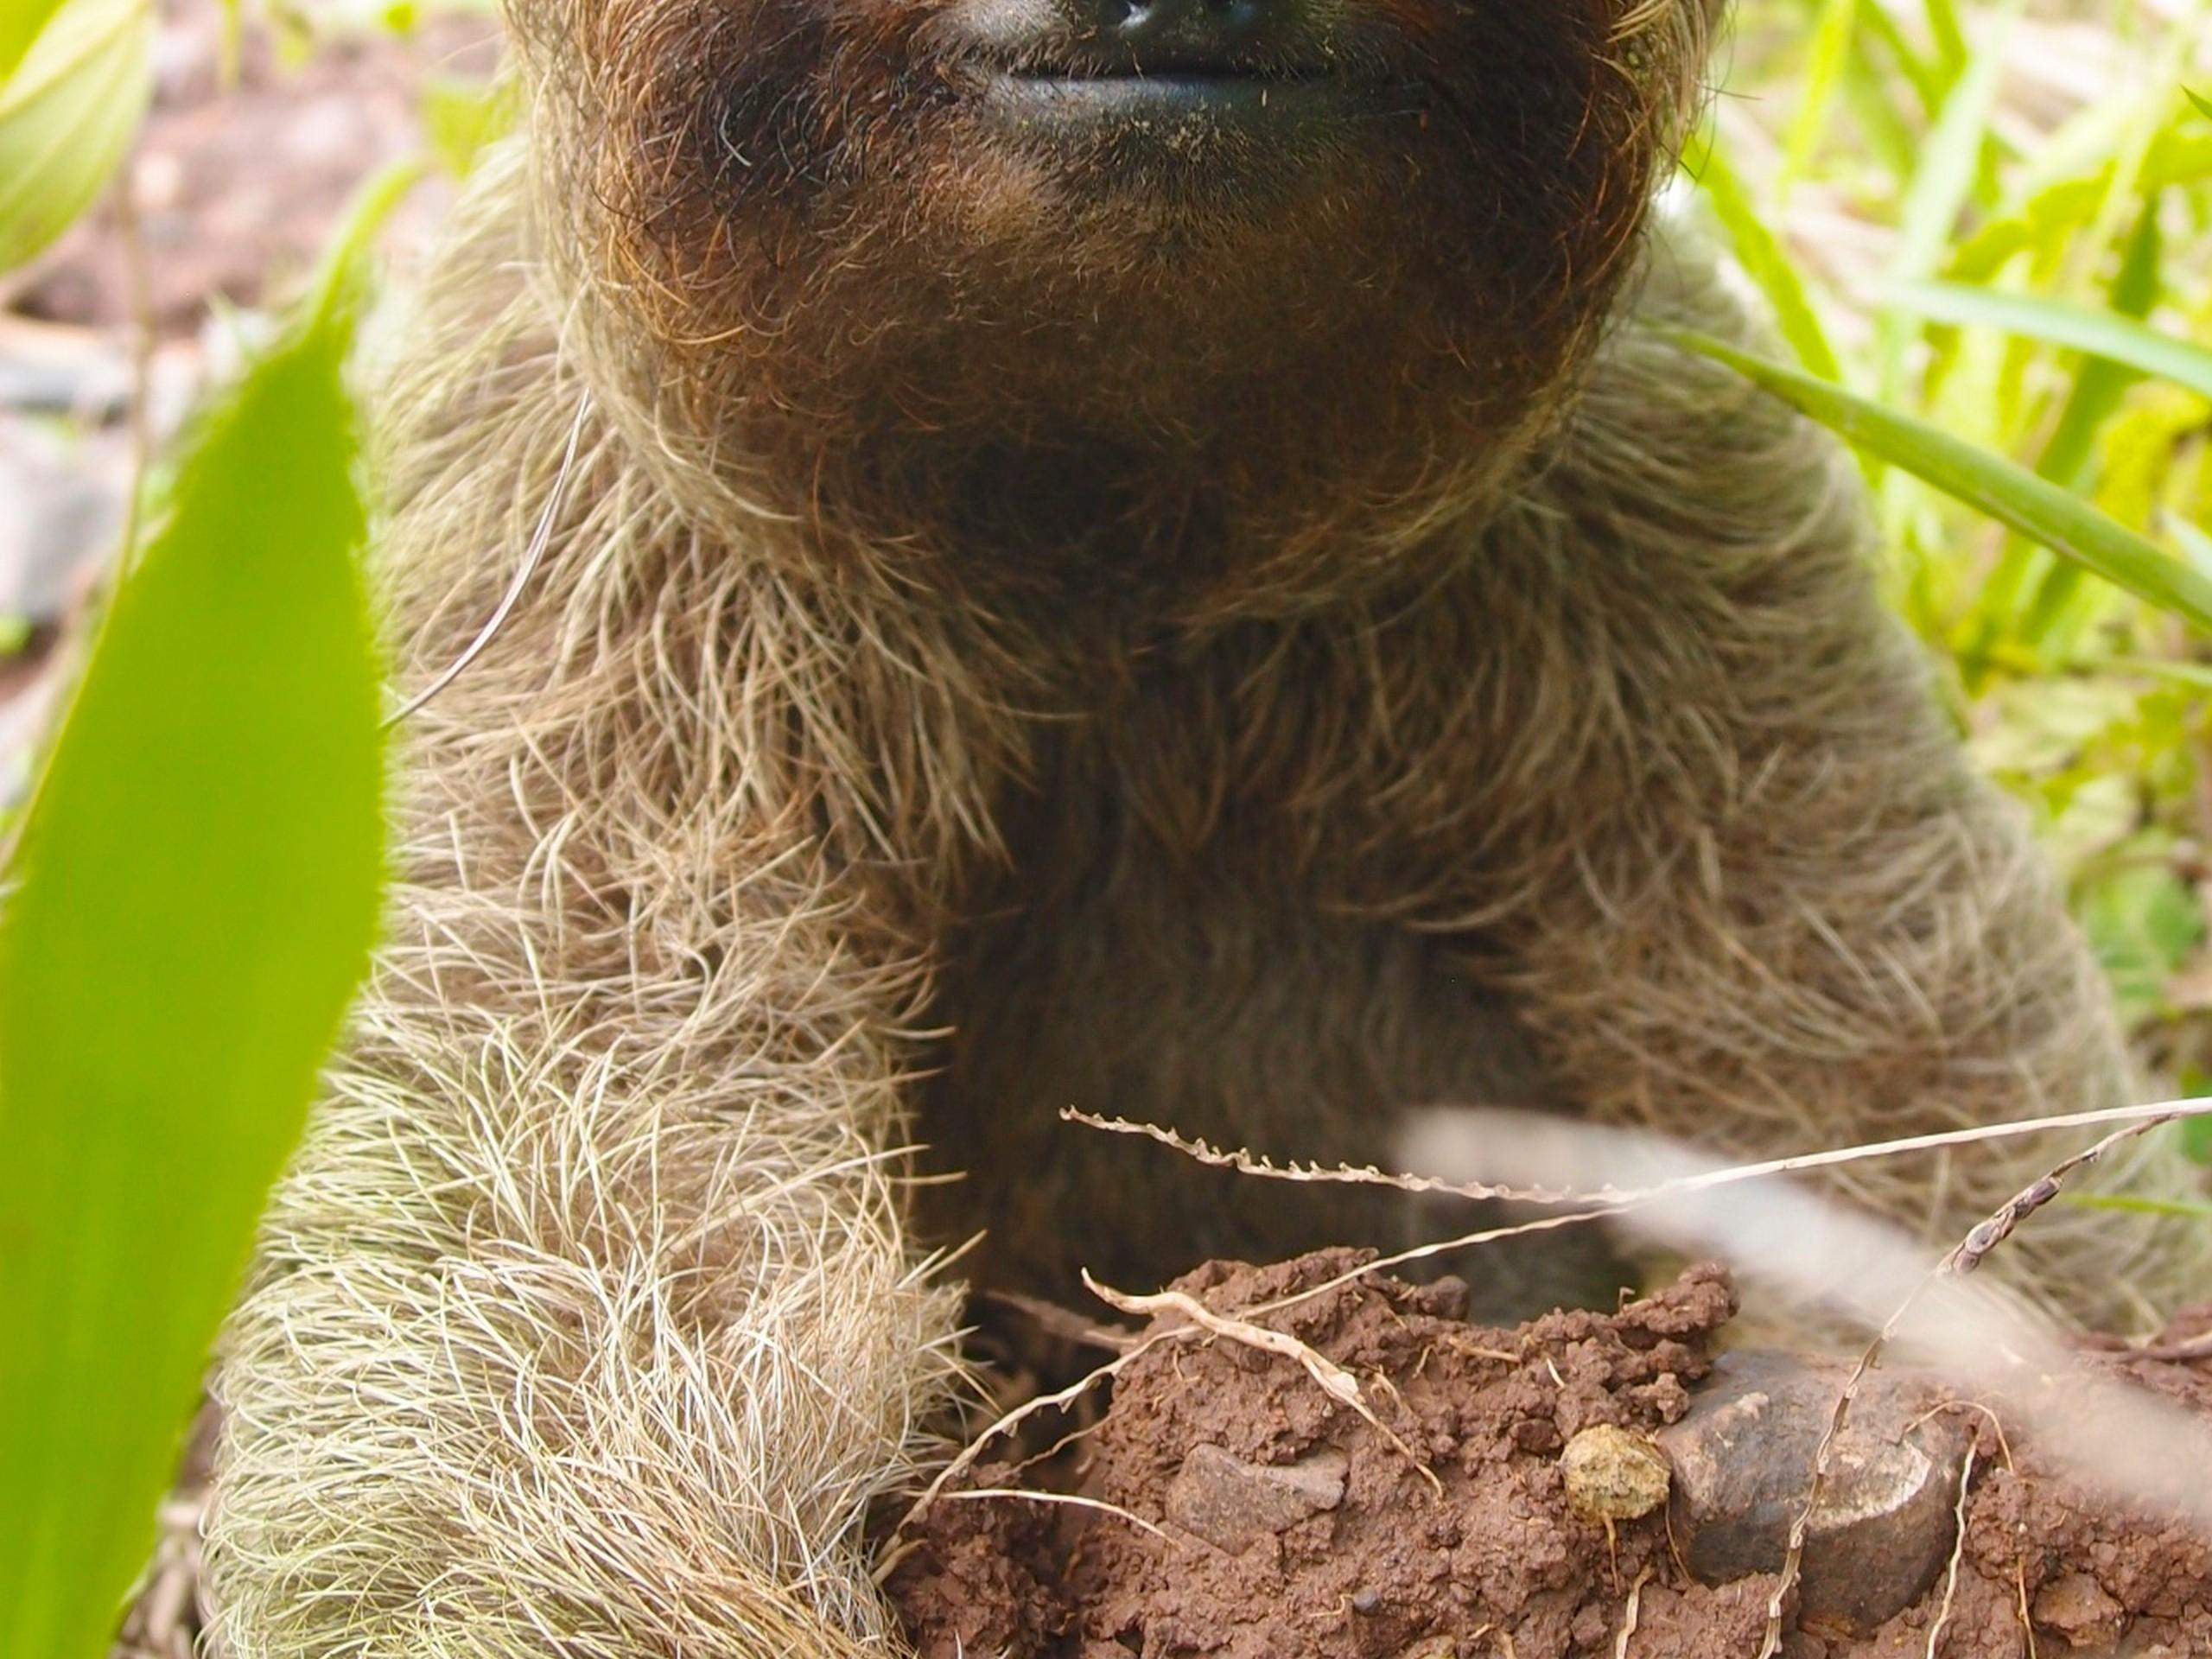 Sloth in Nicaragua